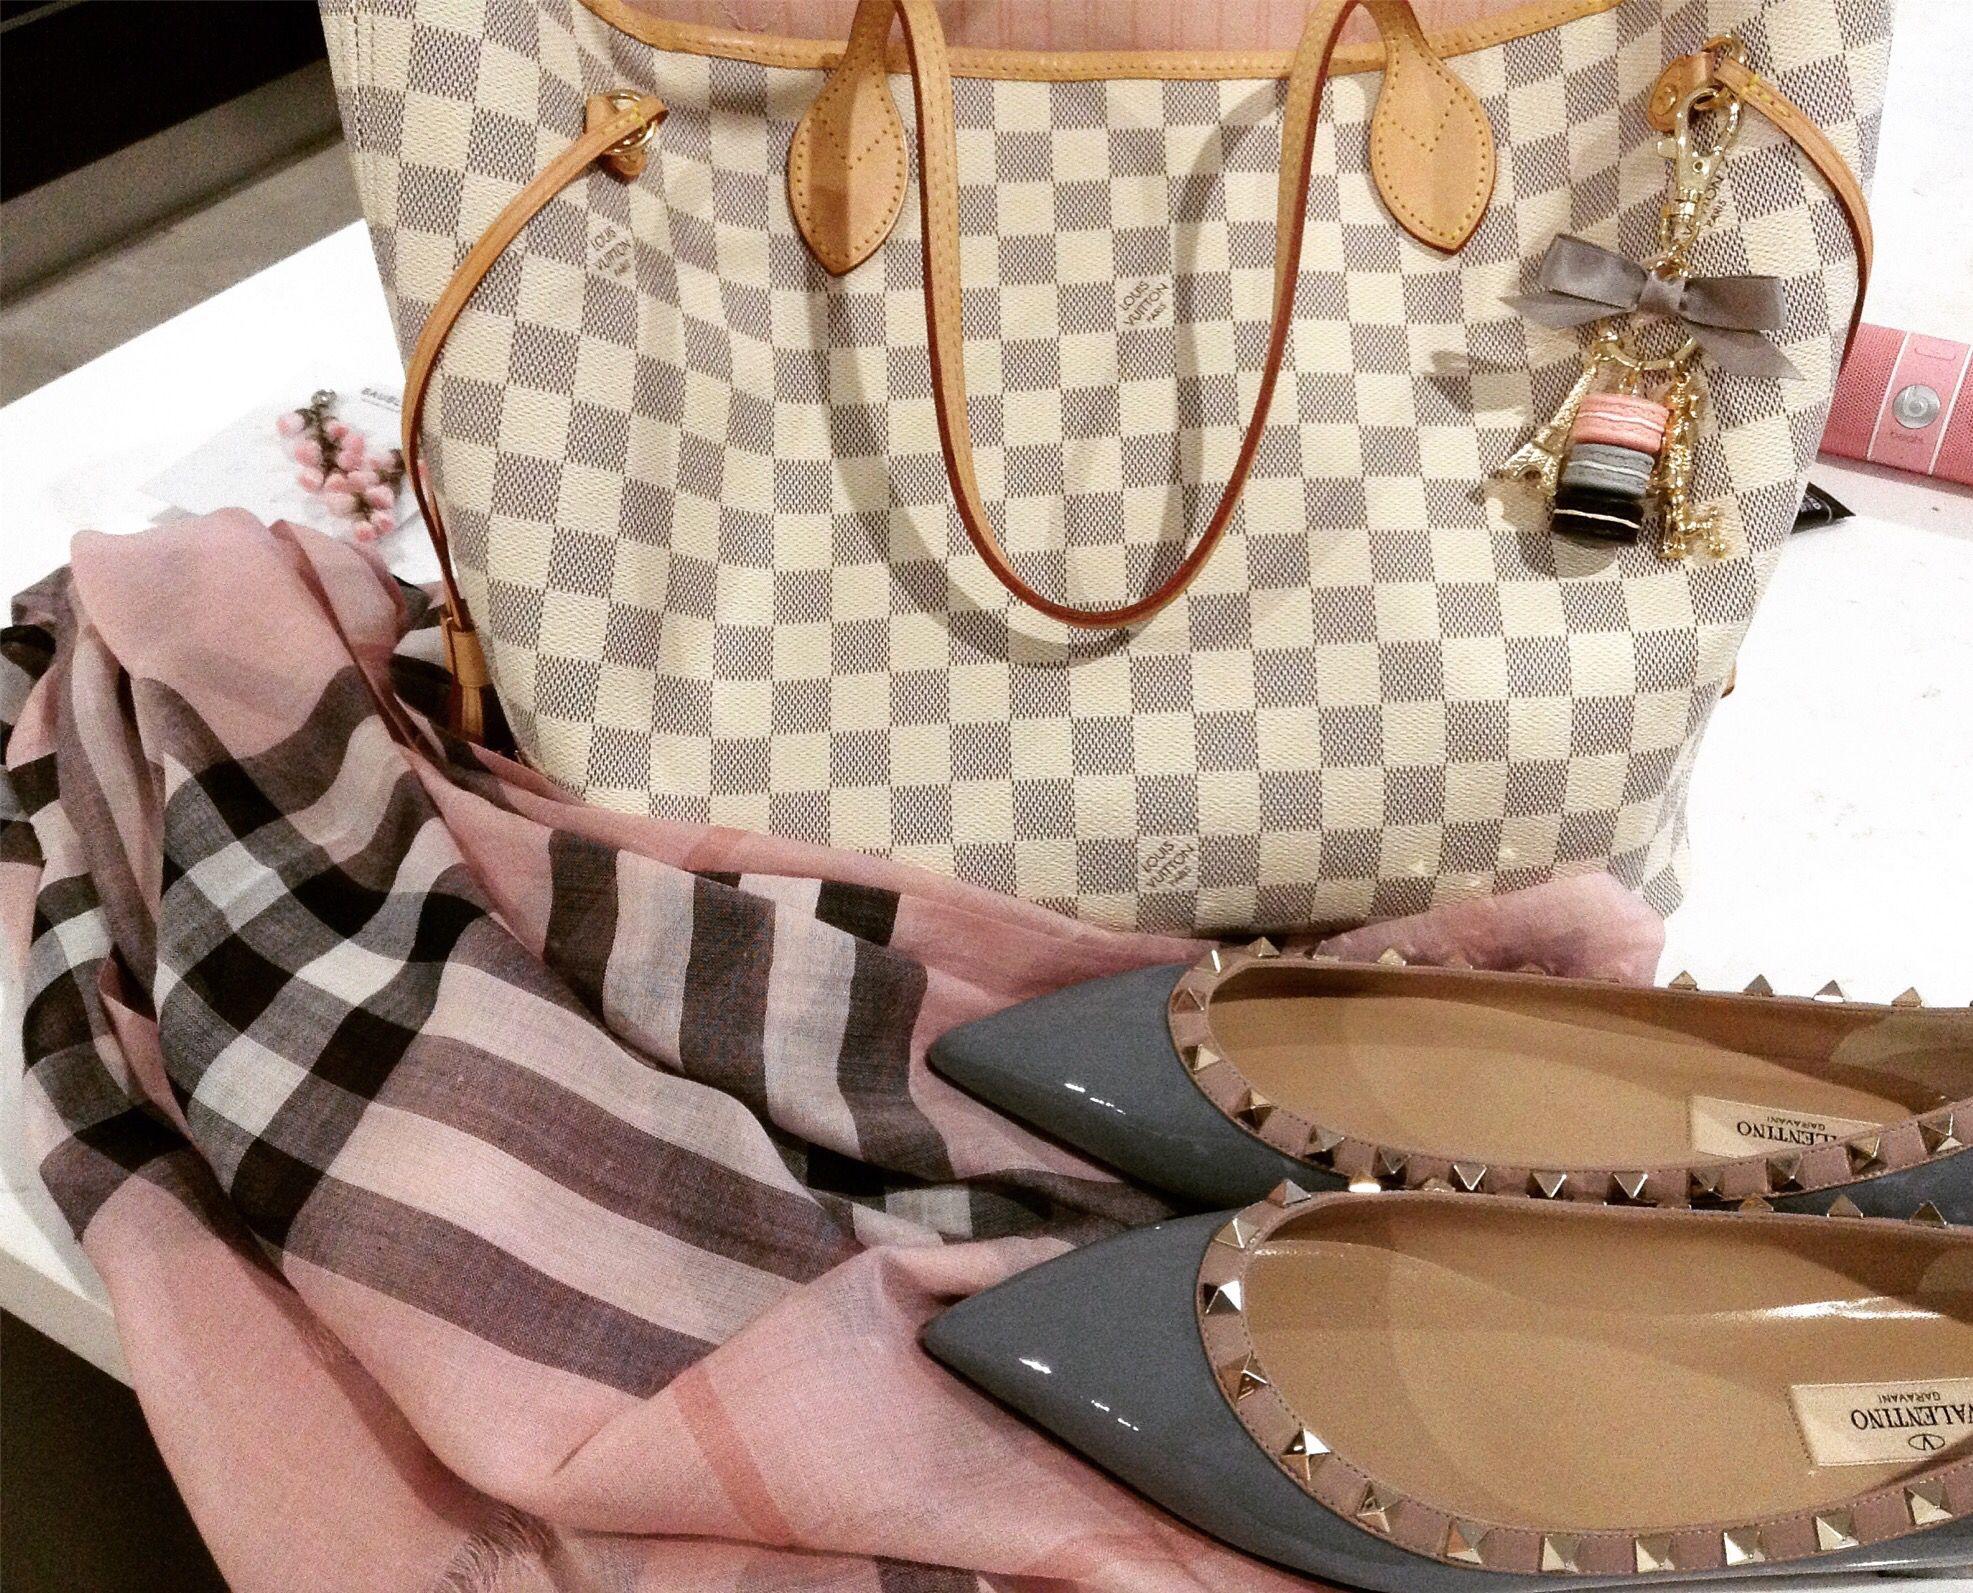 c971c8eafca Louis Vuitton Damier azur neverfull, neverfull mm, rose Ballerine neverfull,  Burberry scarf, pink Burberry scarf, Burberry gauze scarf, grey Valentinos,  ...